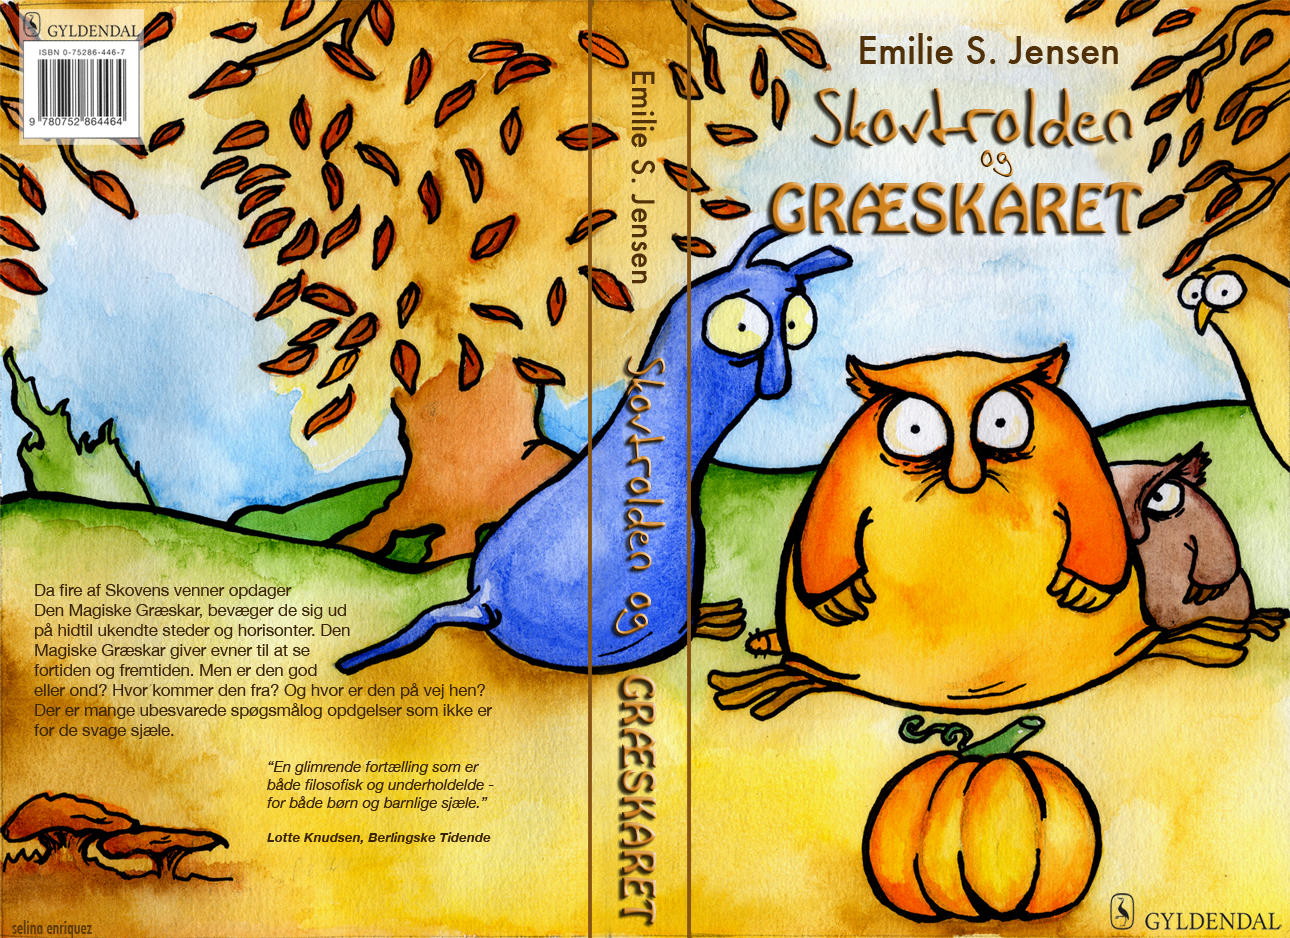 Children S Book Cover Art : Children s book cover by wearethegodsnow on deviantart